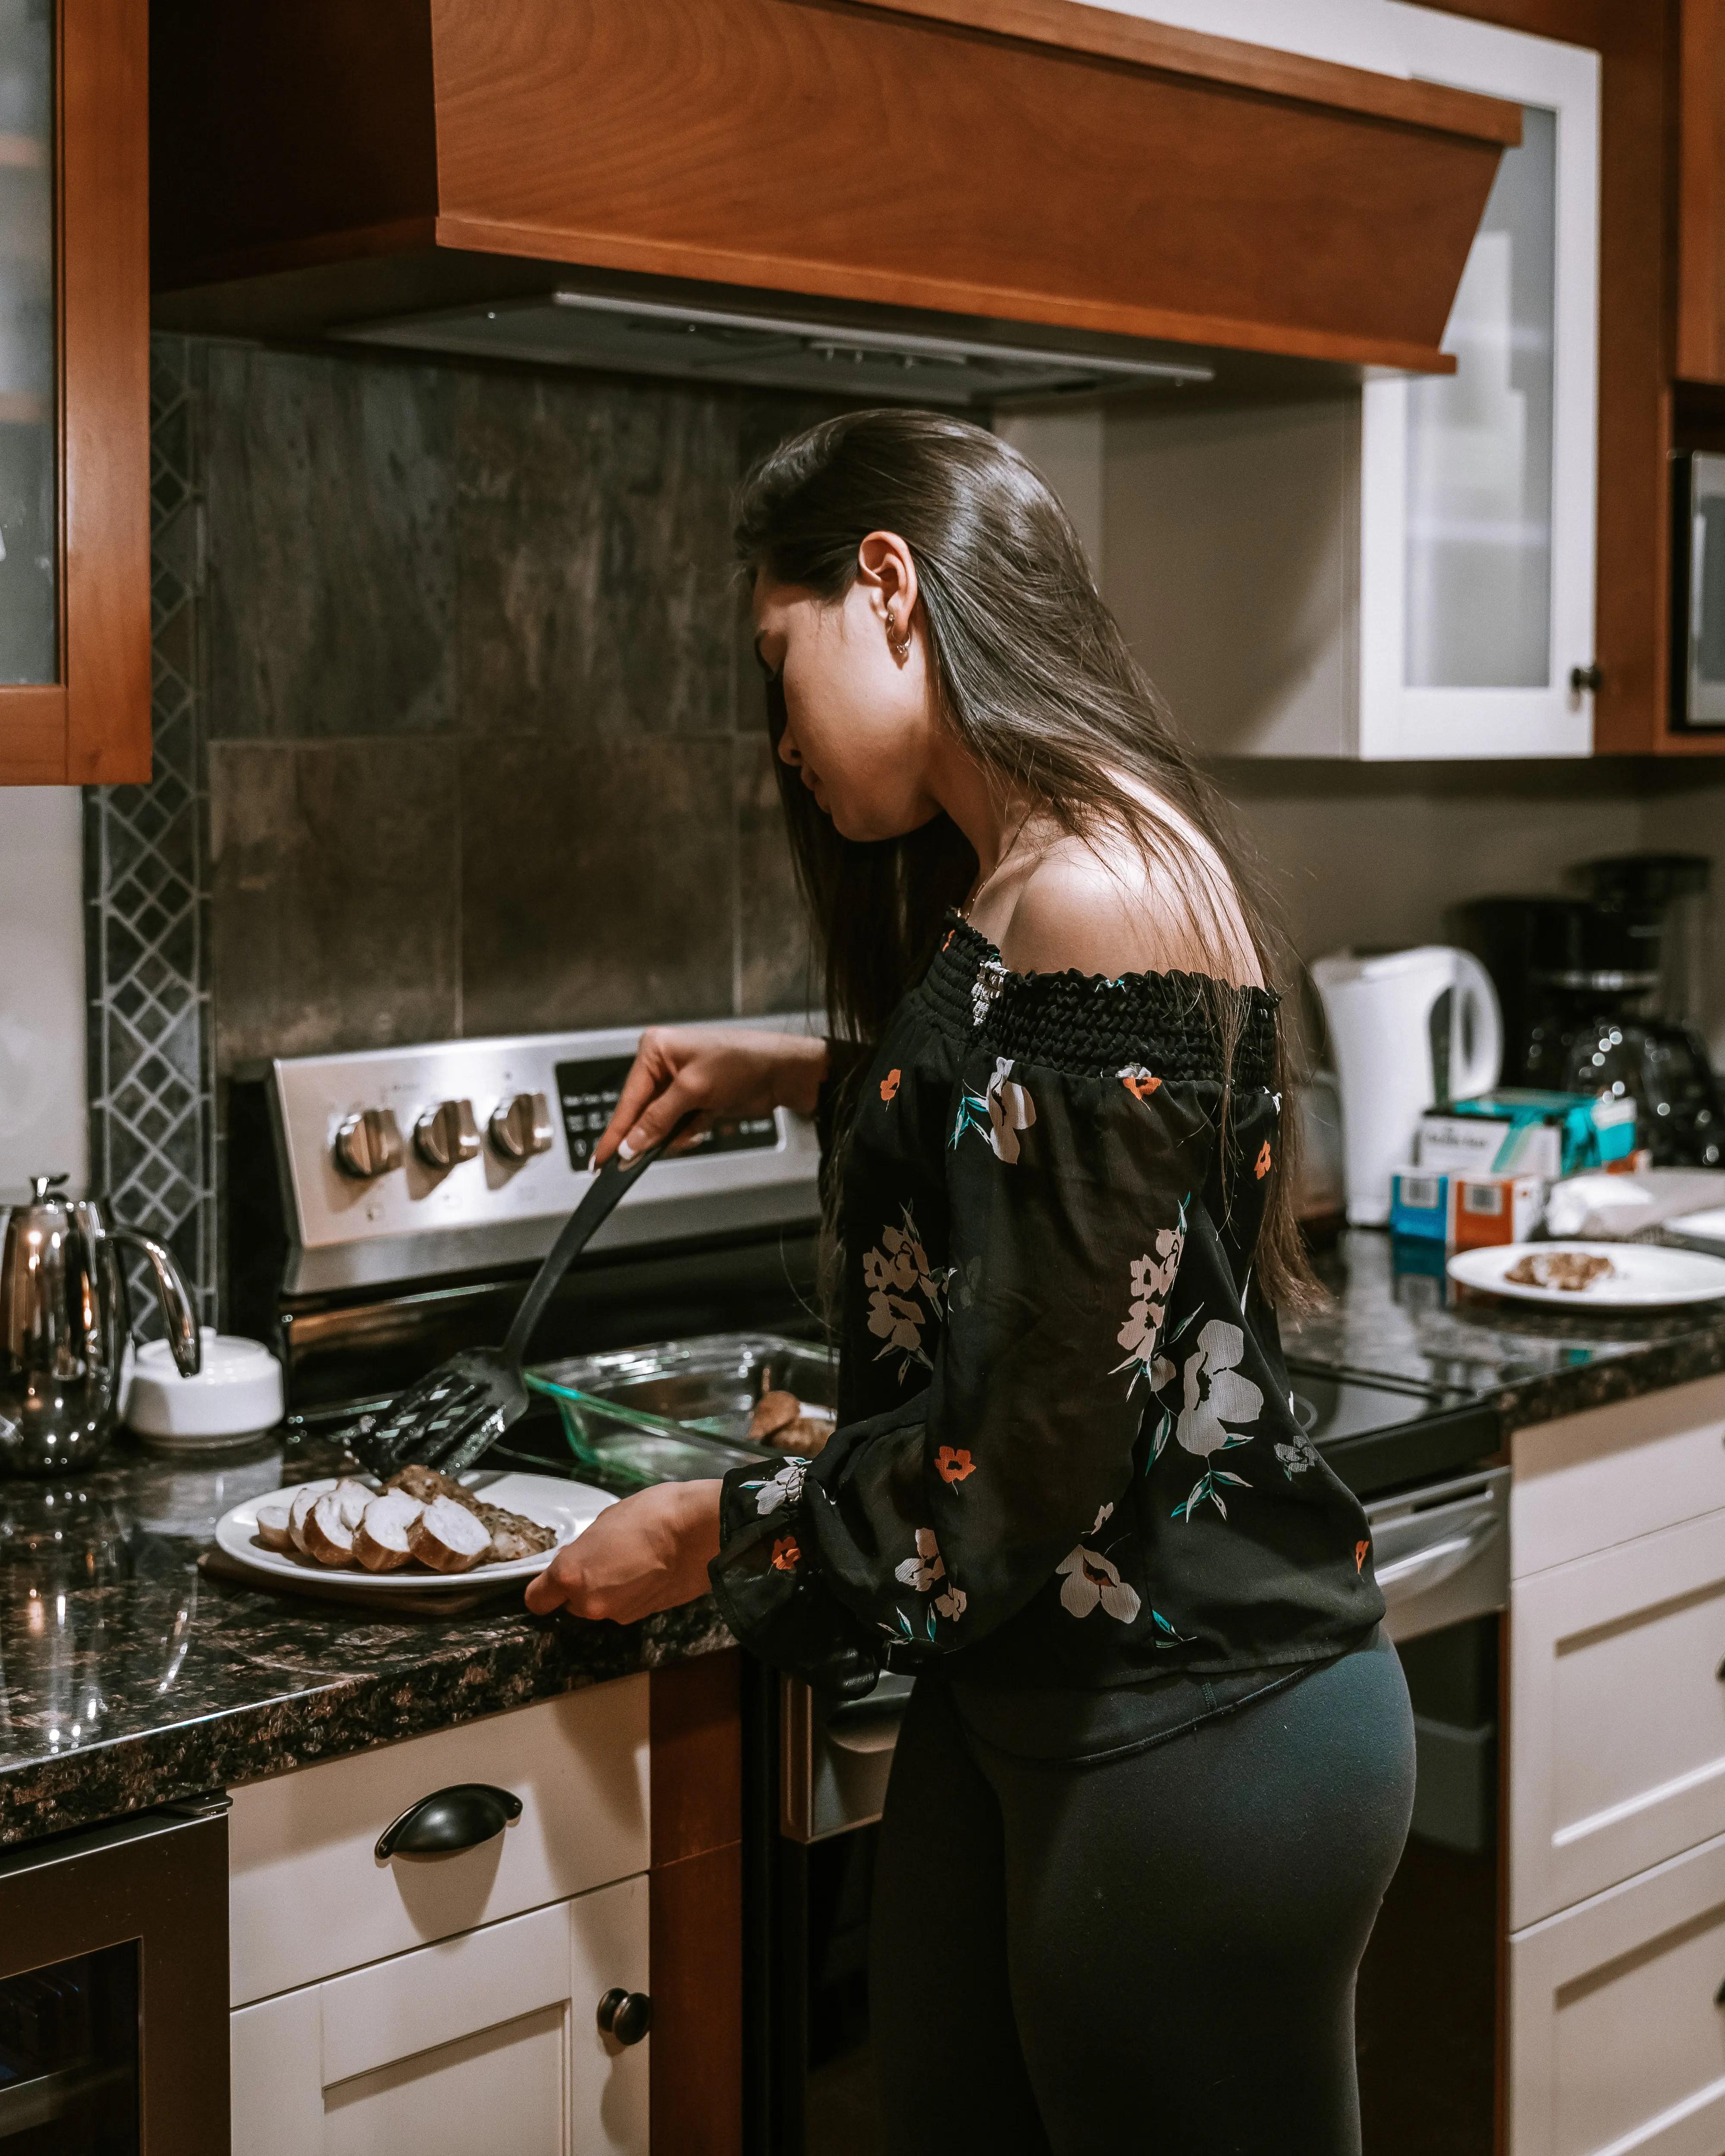 48 Hours in Canmore - Solara Resort & Spa 2-Bedroom Suite Kitchen